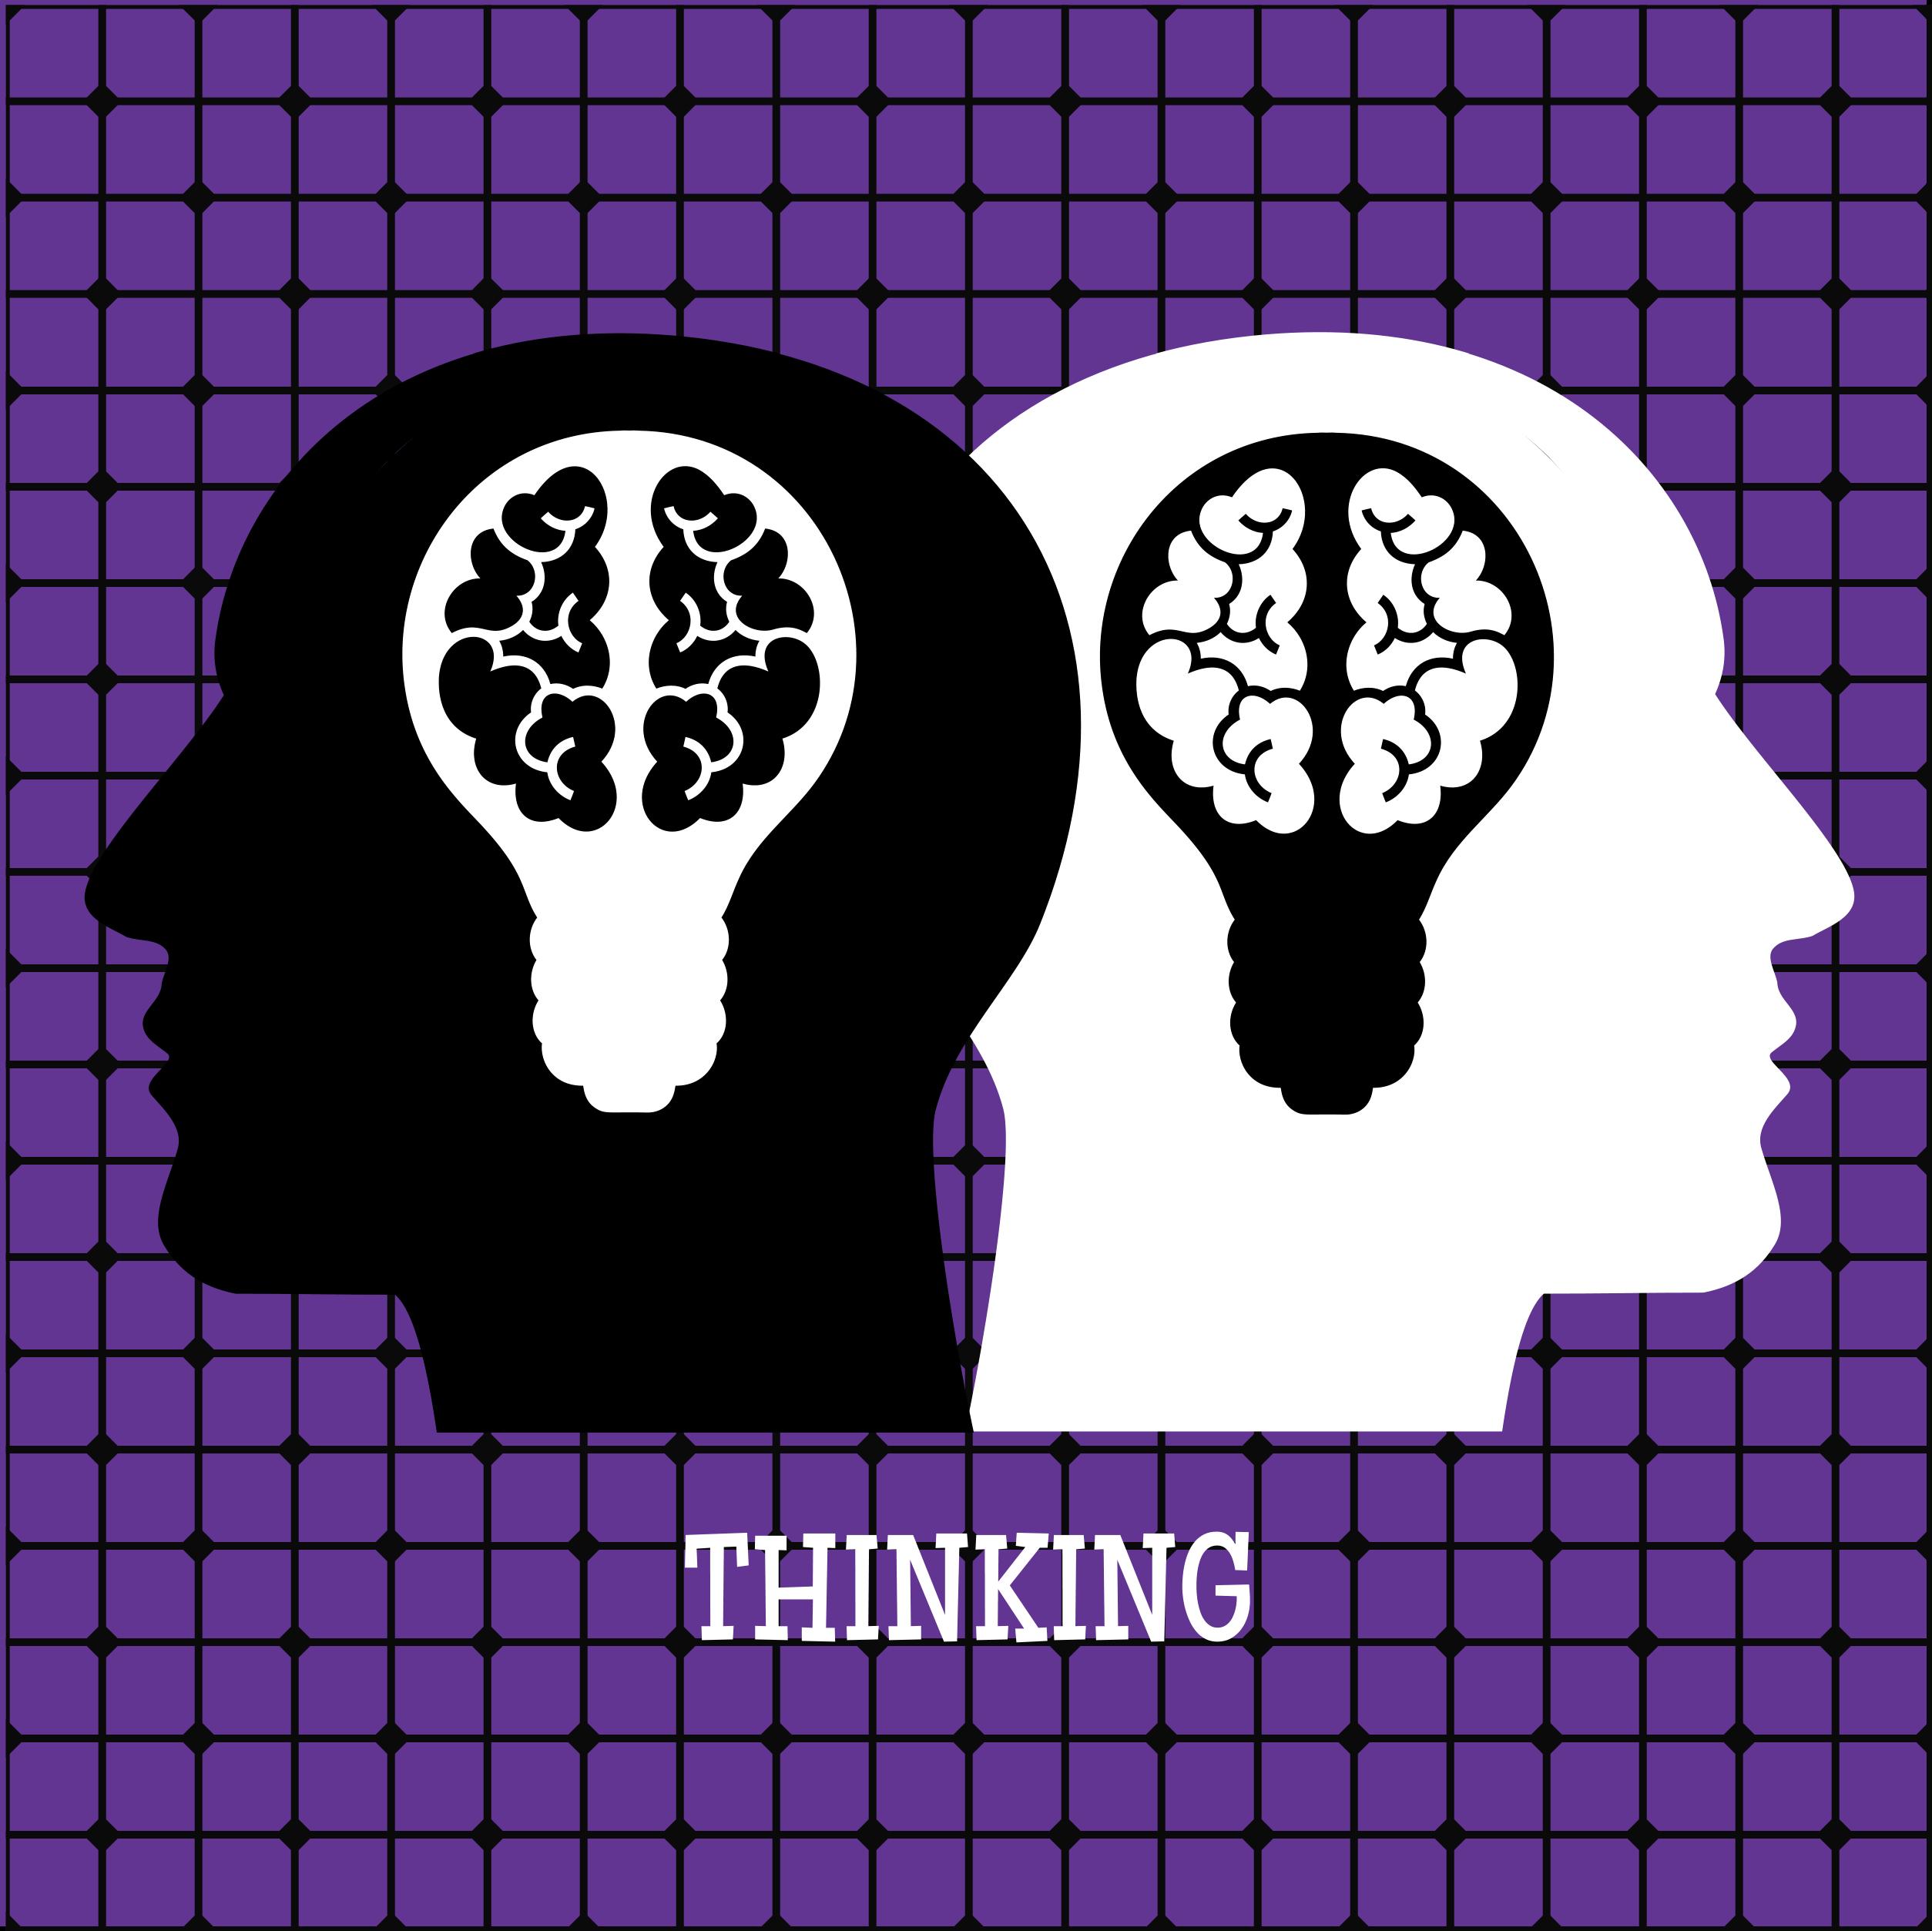 Black-and-white-thinking